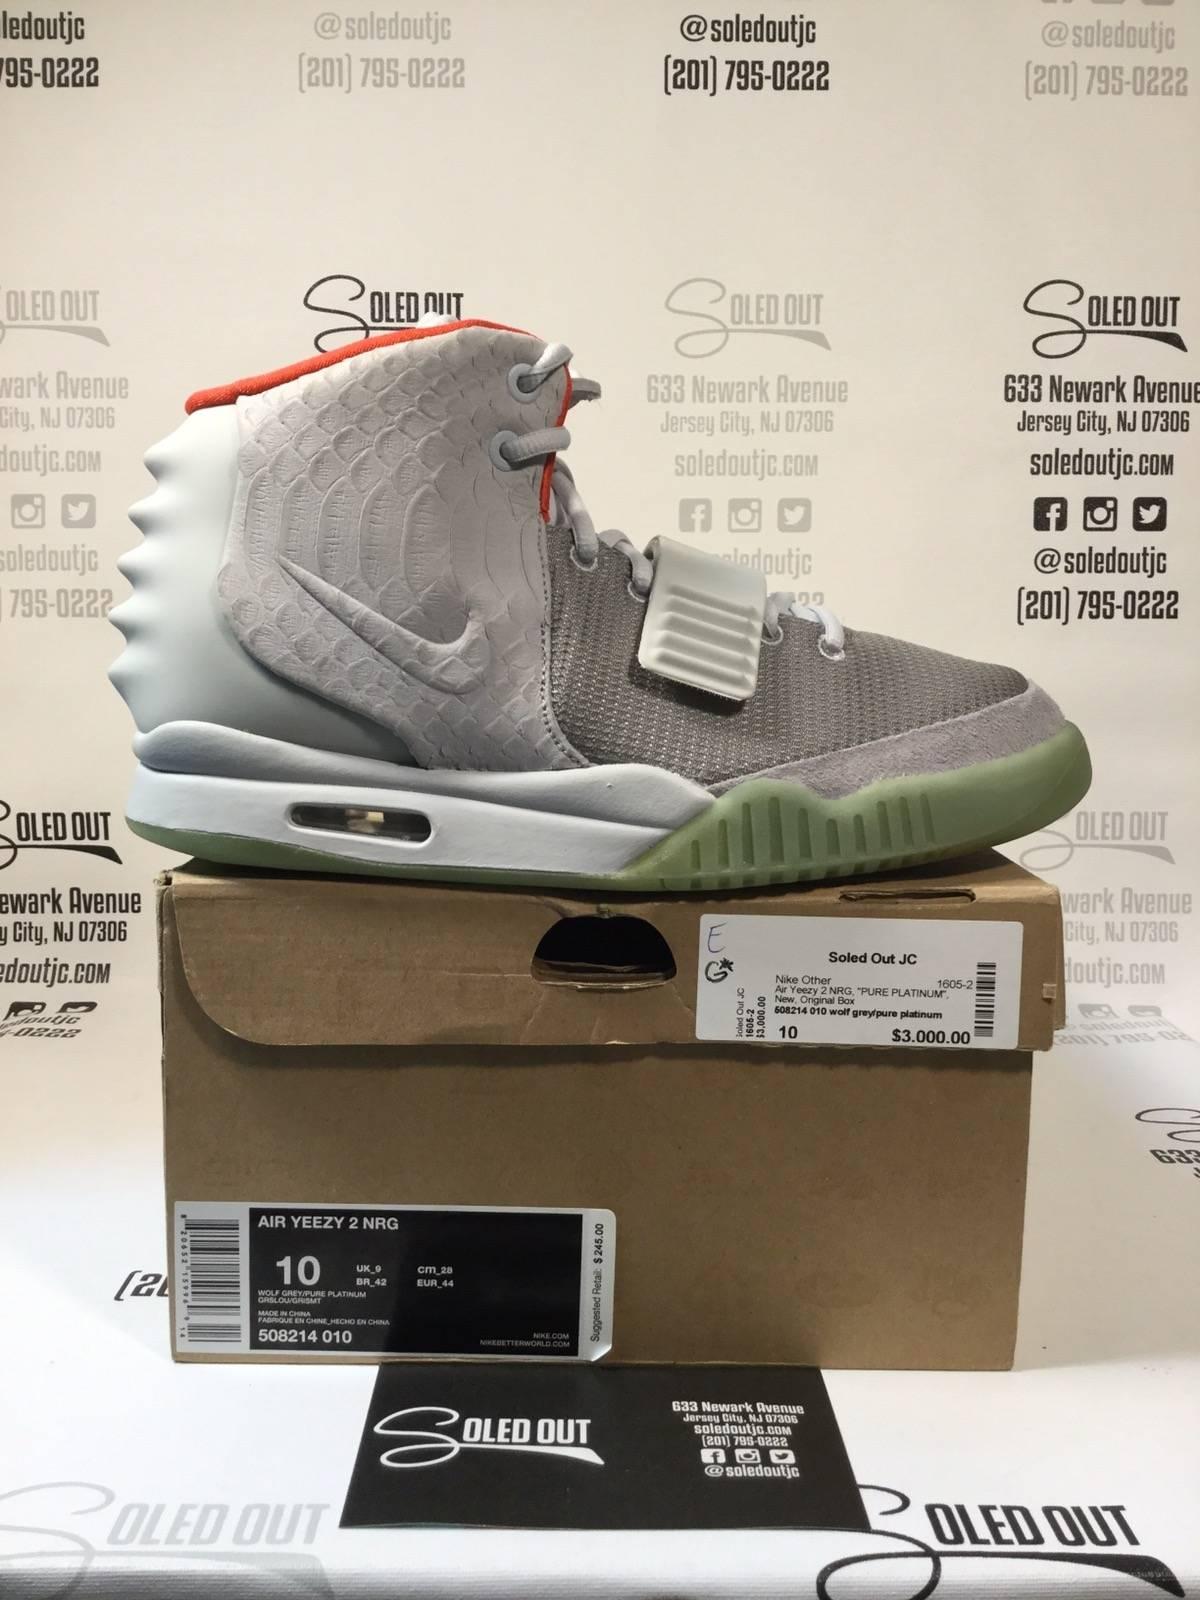 7131443036c Nike (1605-2) NIKE AIR YEEZY 2 NRG